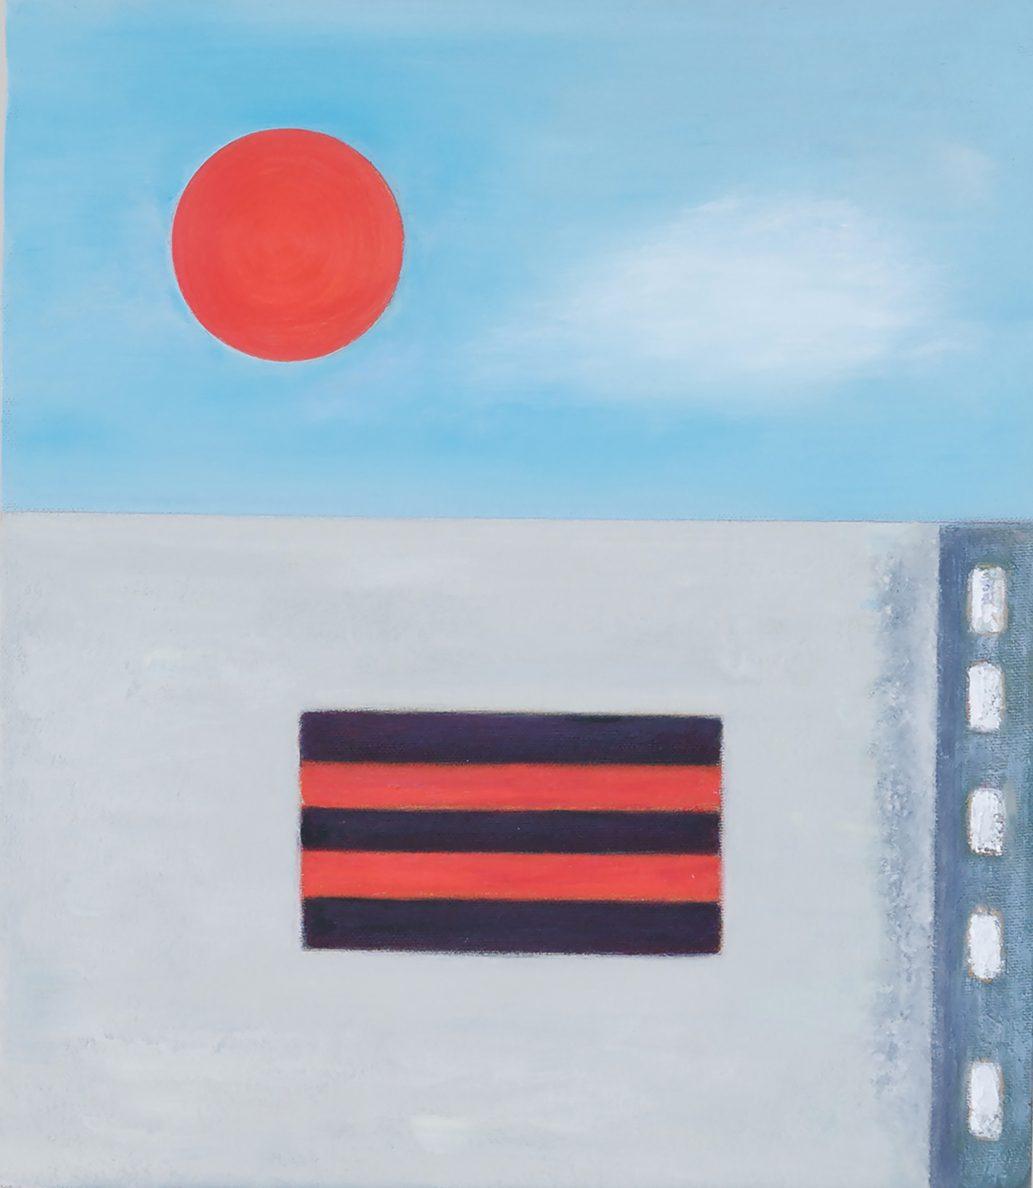 Abstract Beach Colin Williams